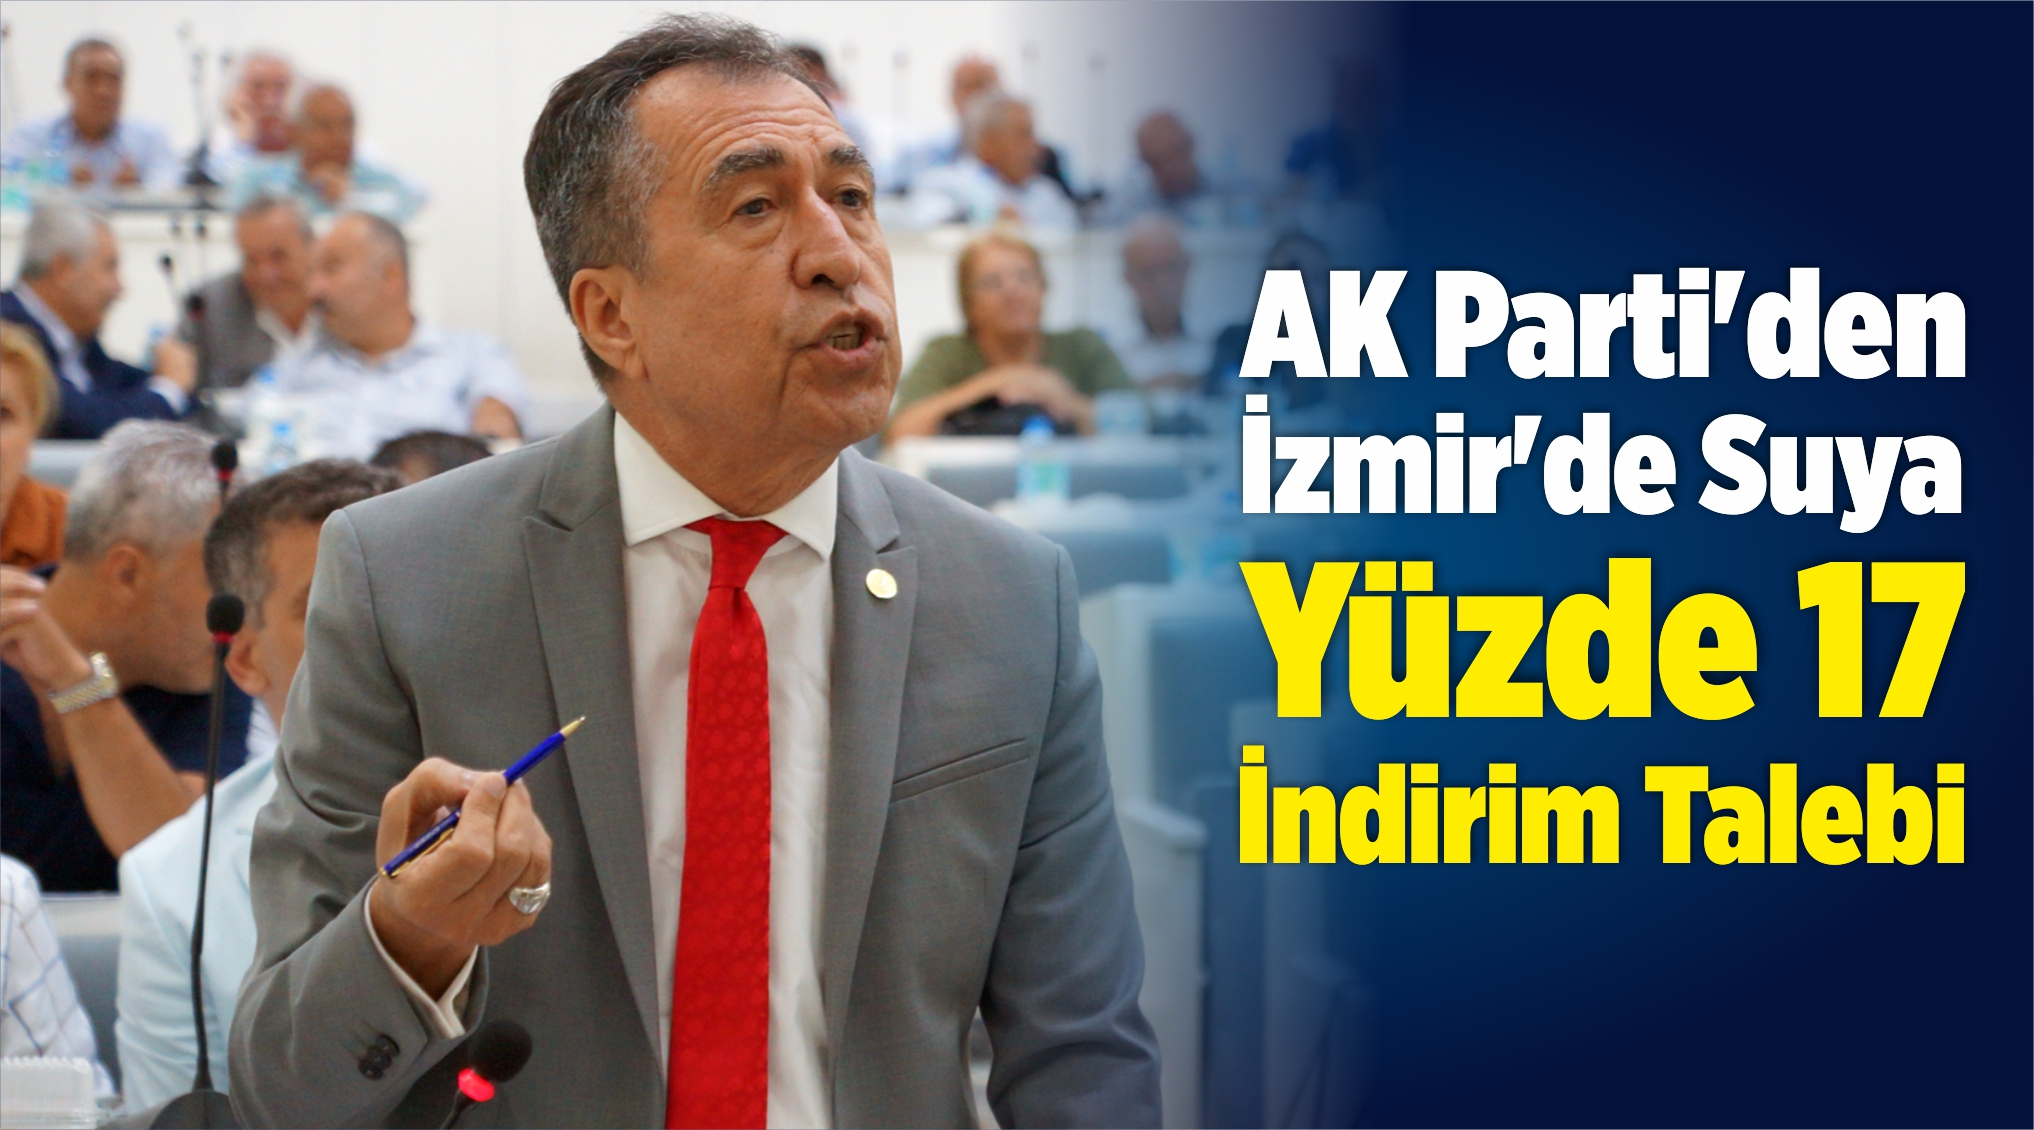 AK Parti'den İzmir'de Suya Yüzde 17 İndirim Talebi